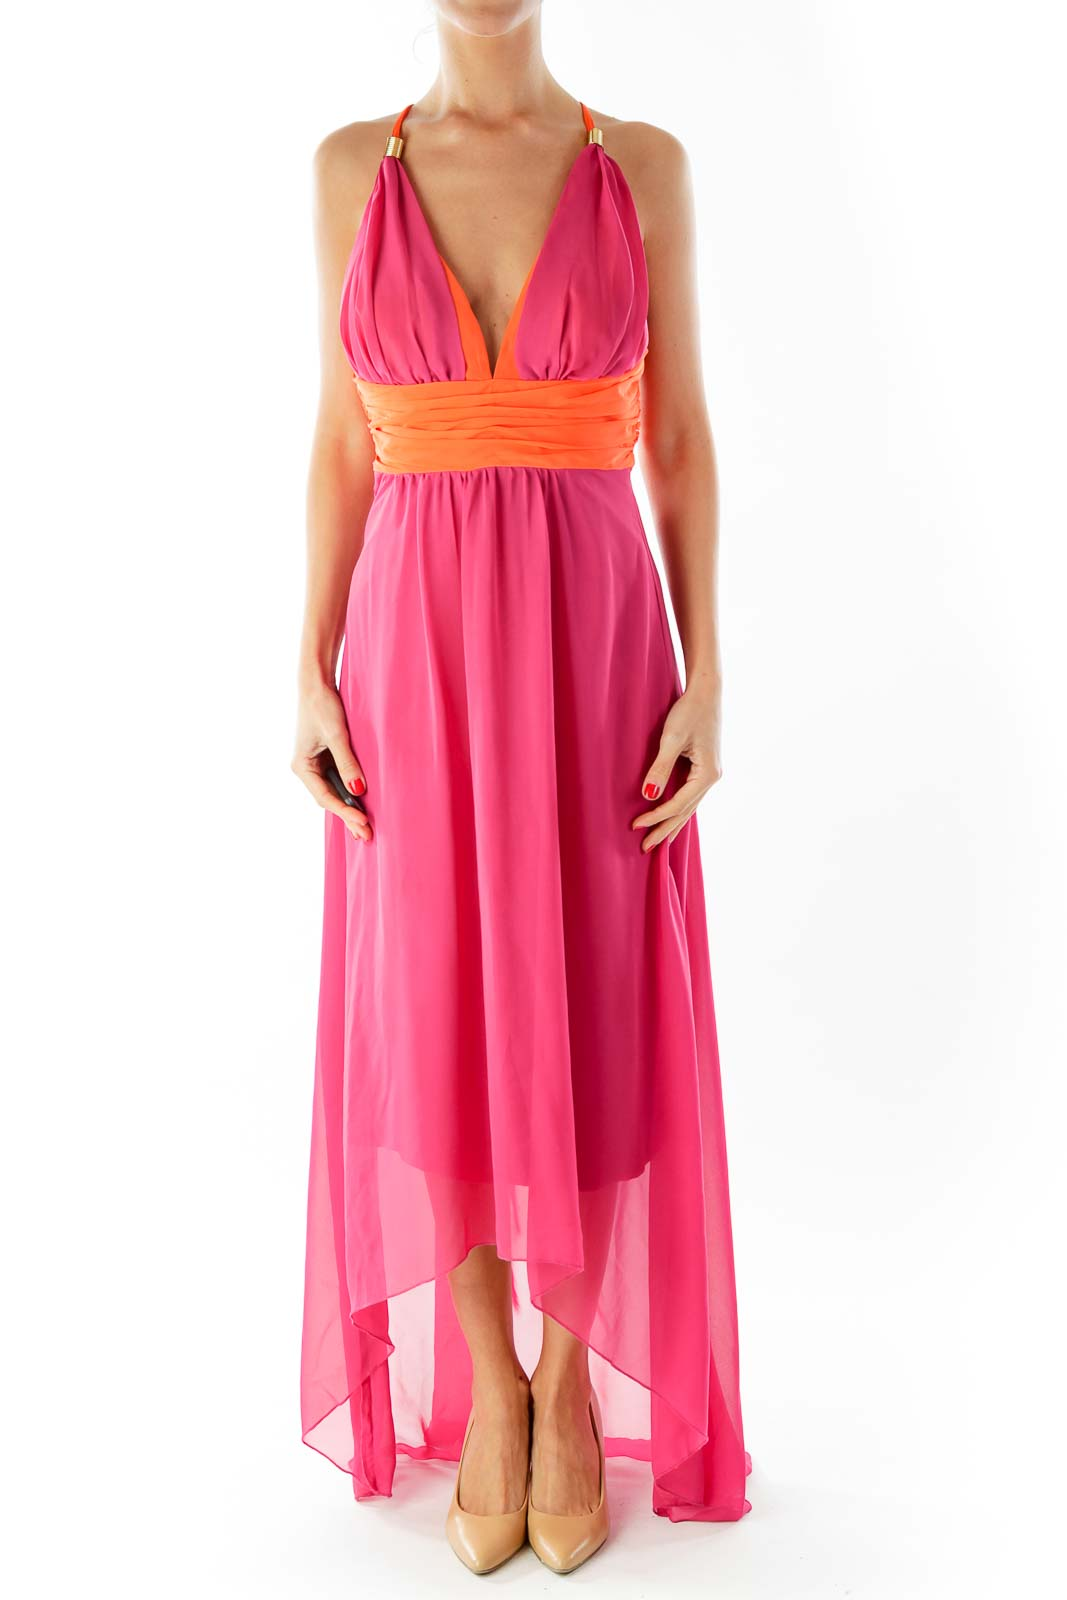 Orange & Pink Silk Maxi-Dress Front